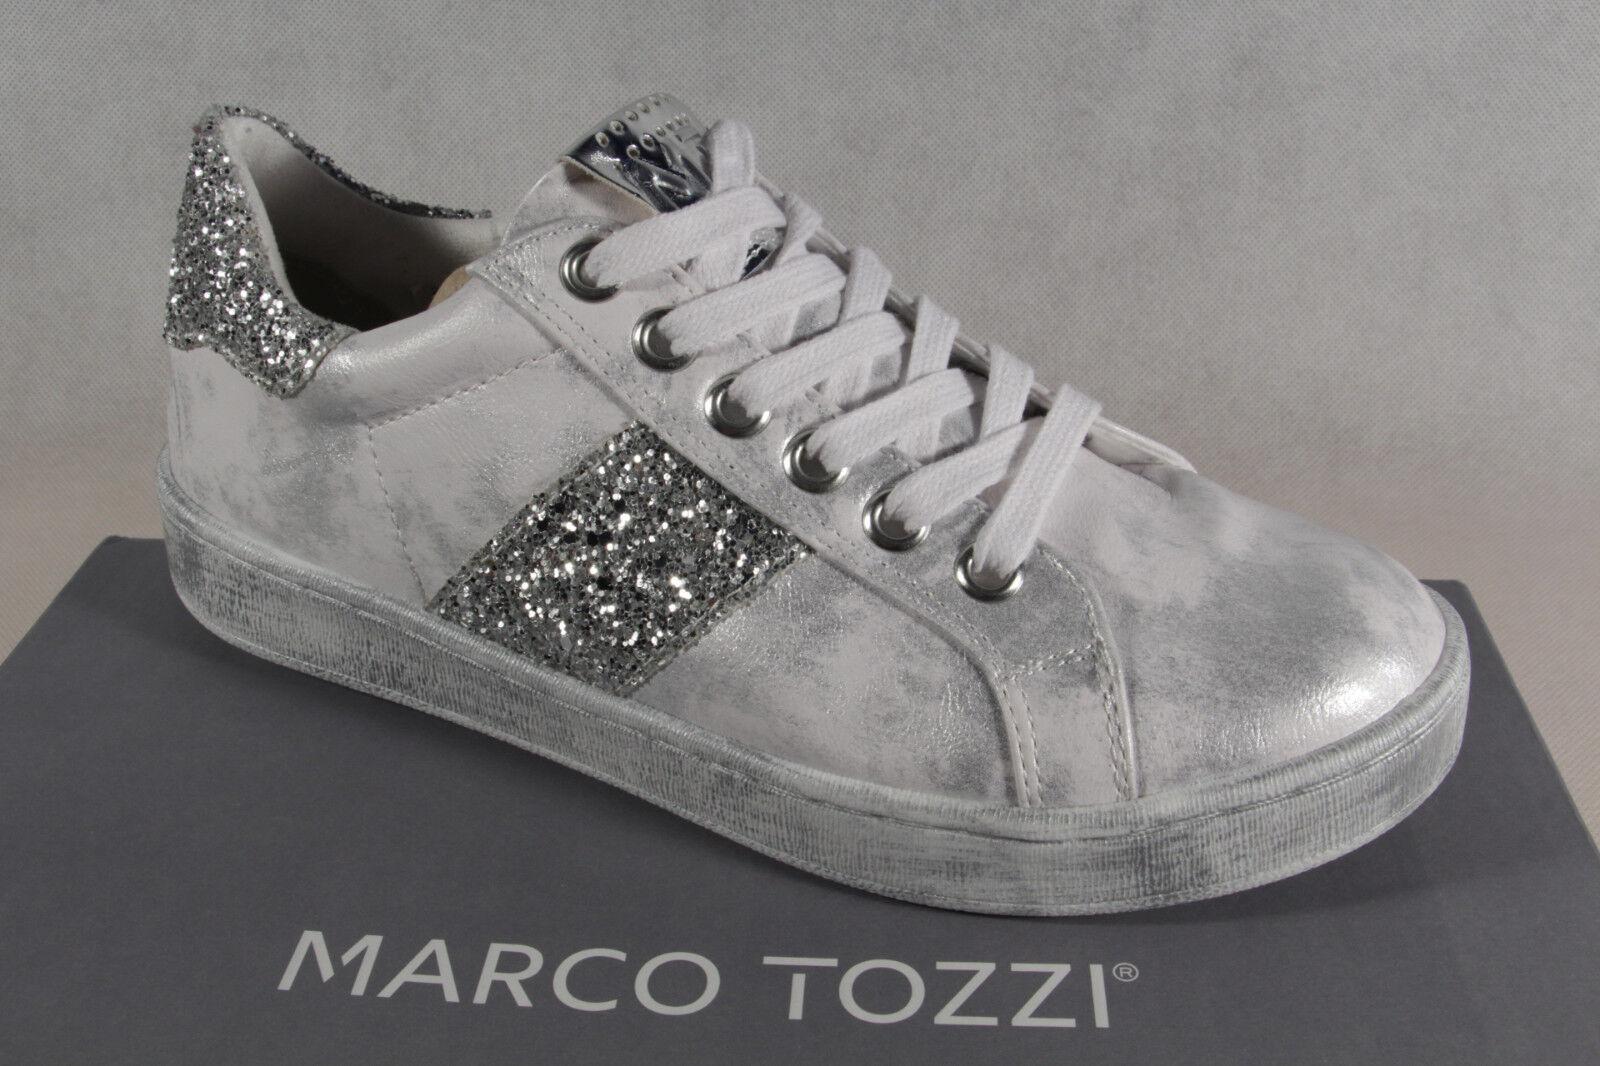 Marco Tozzi Schnürschuhe Sneakers Halbschuhe weiß silber 23737 NEU!